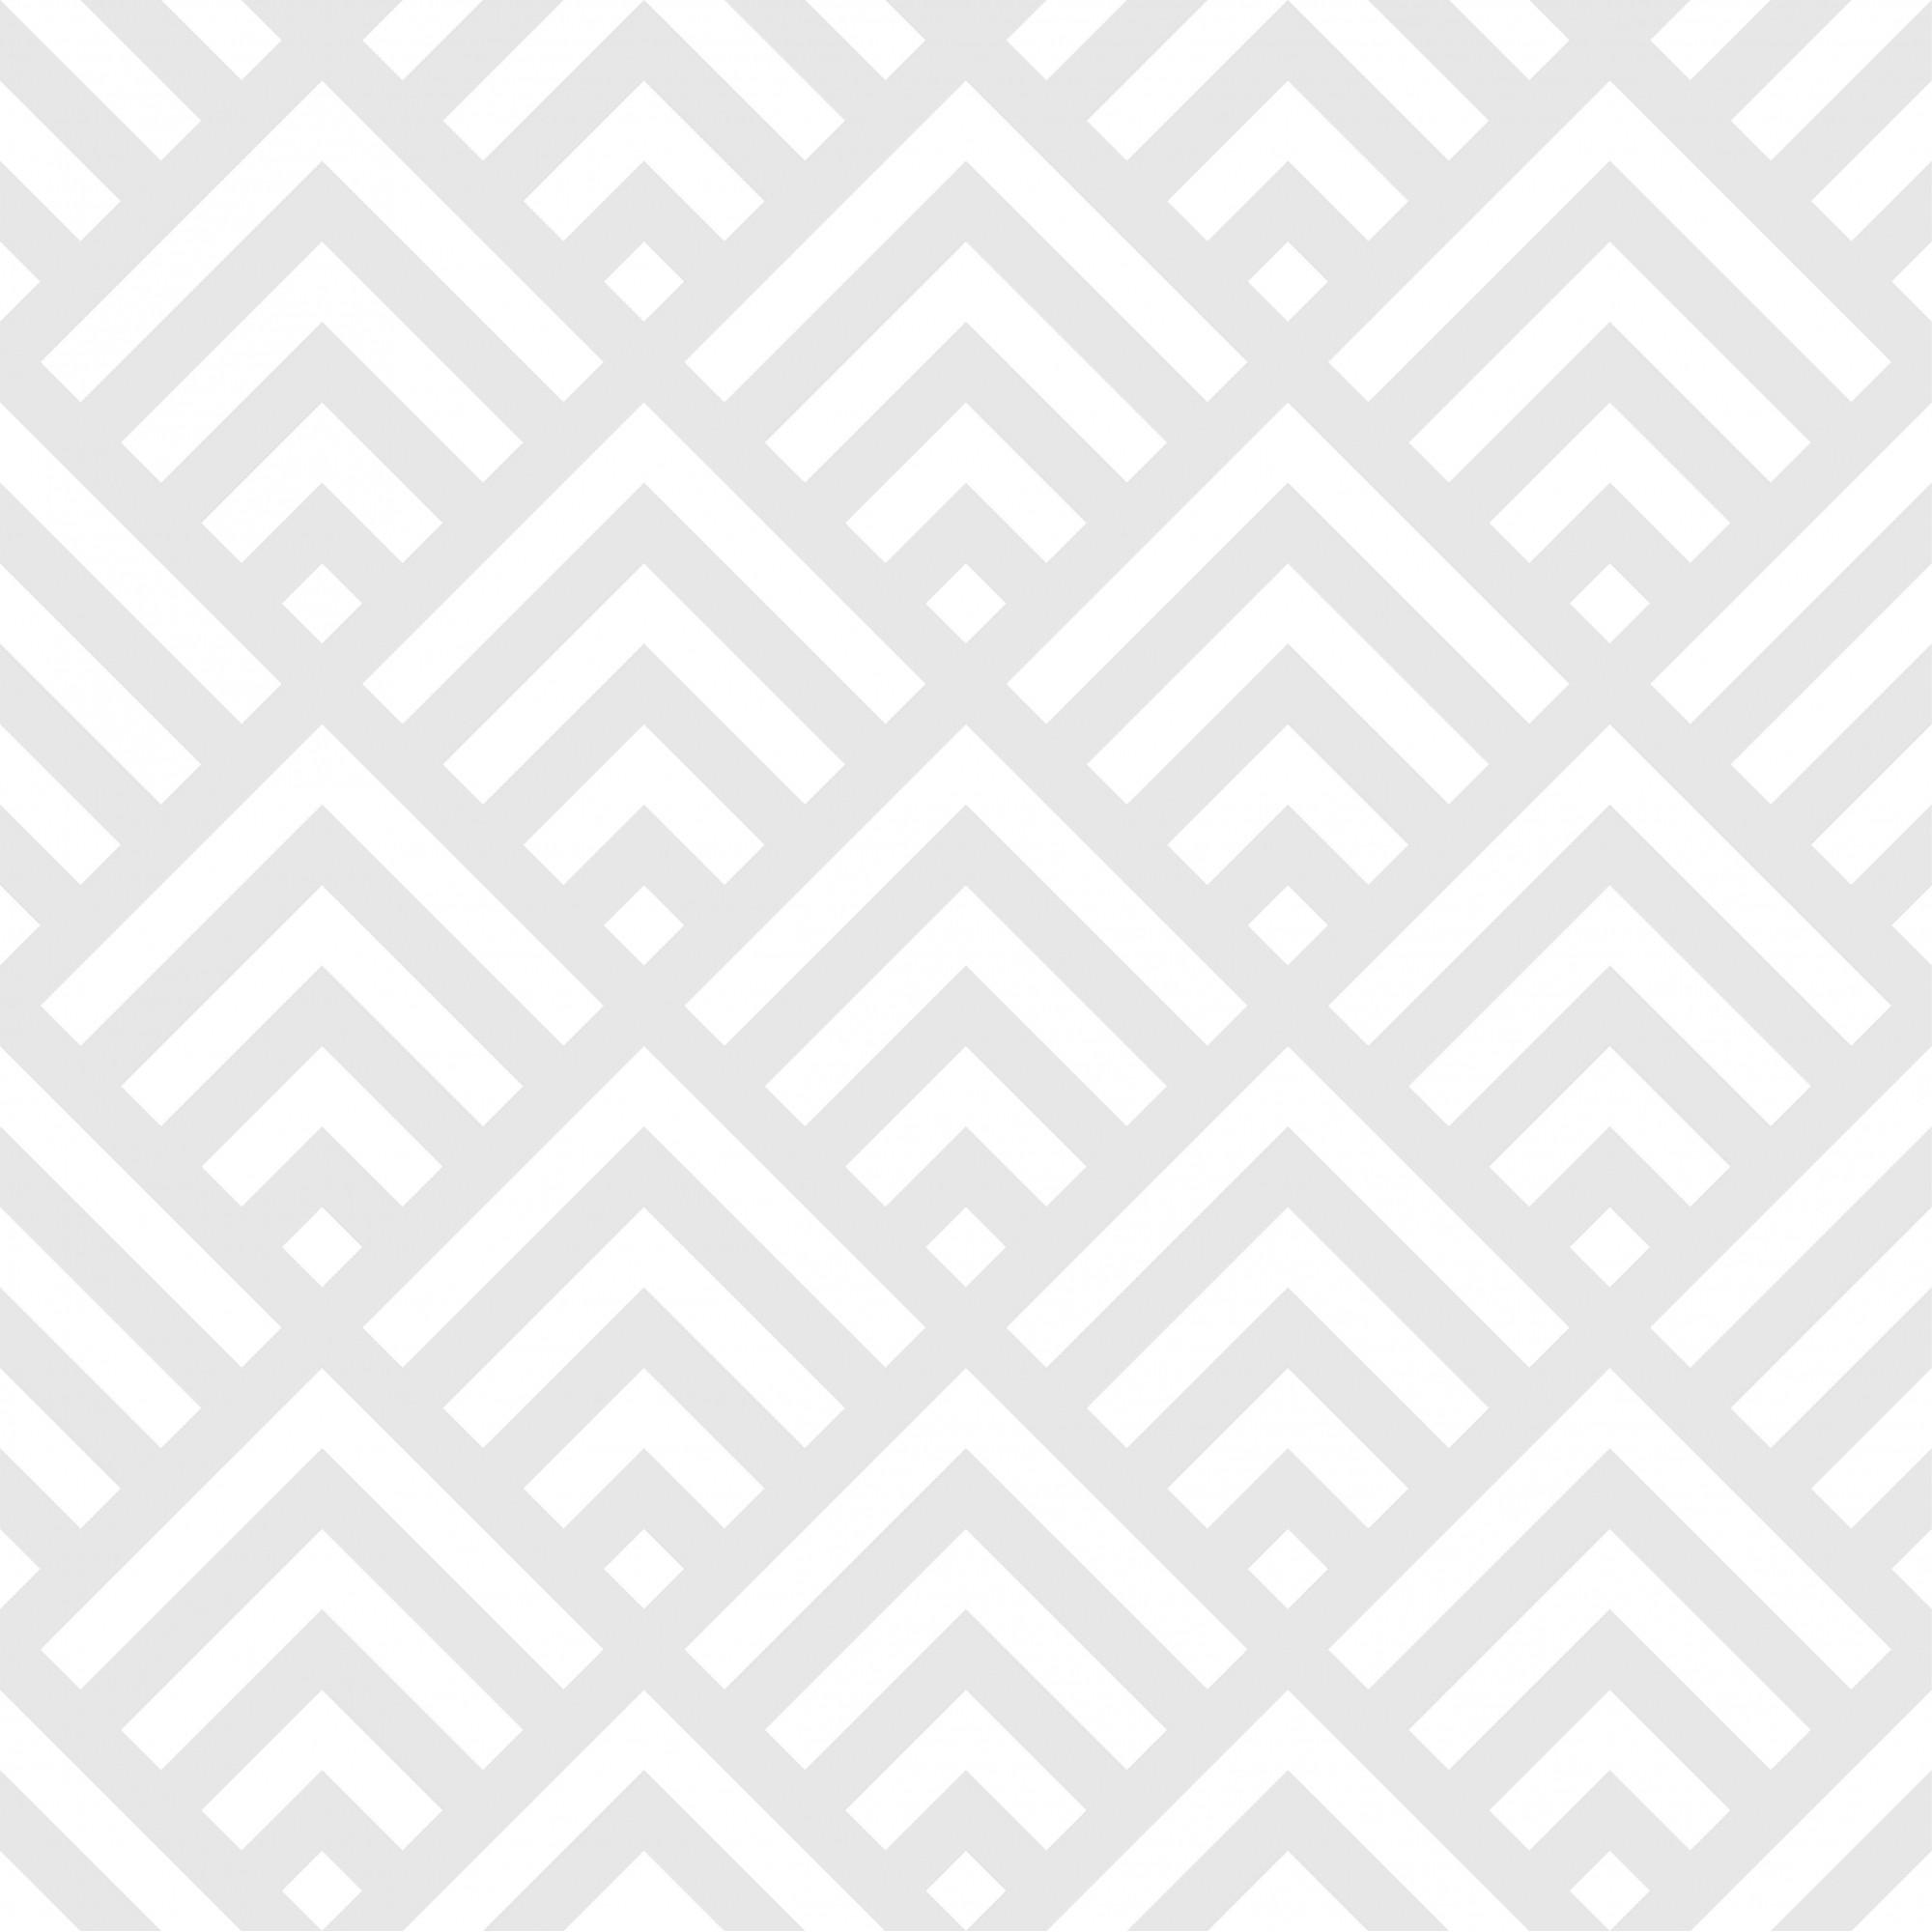 Papel de Parede ADESIVO - Geométrico pirâmide